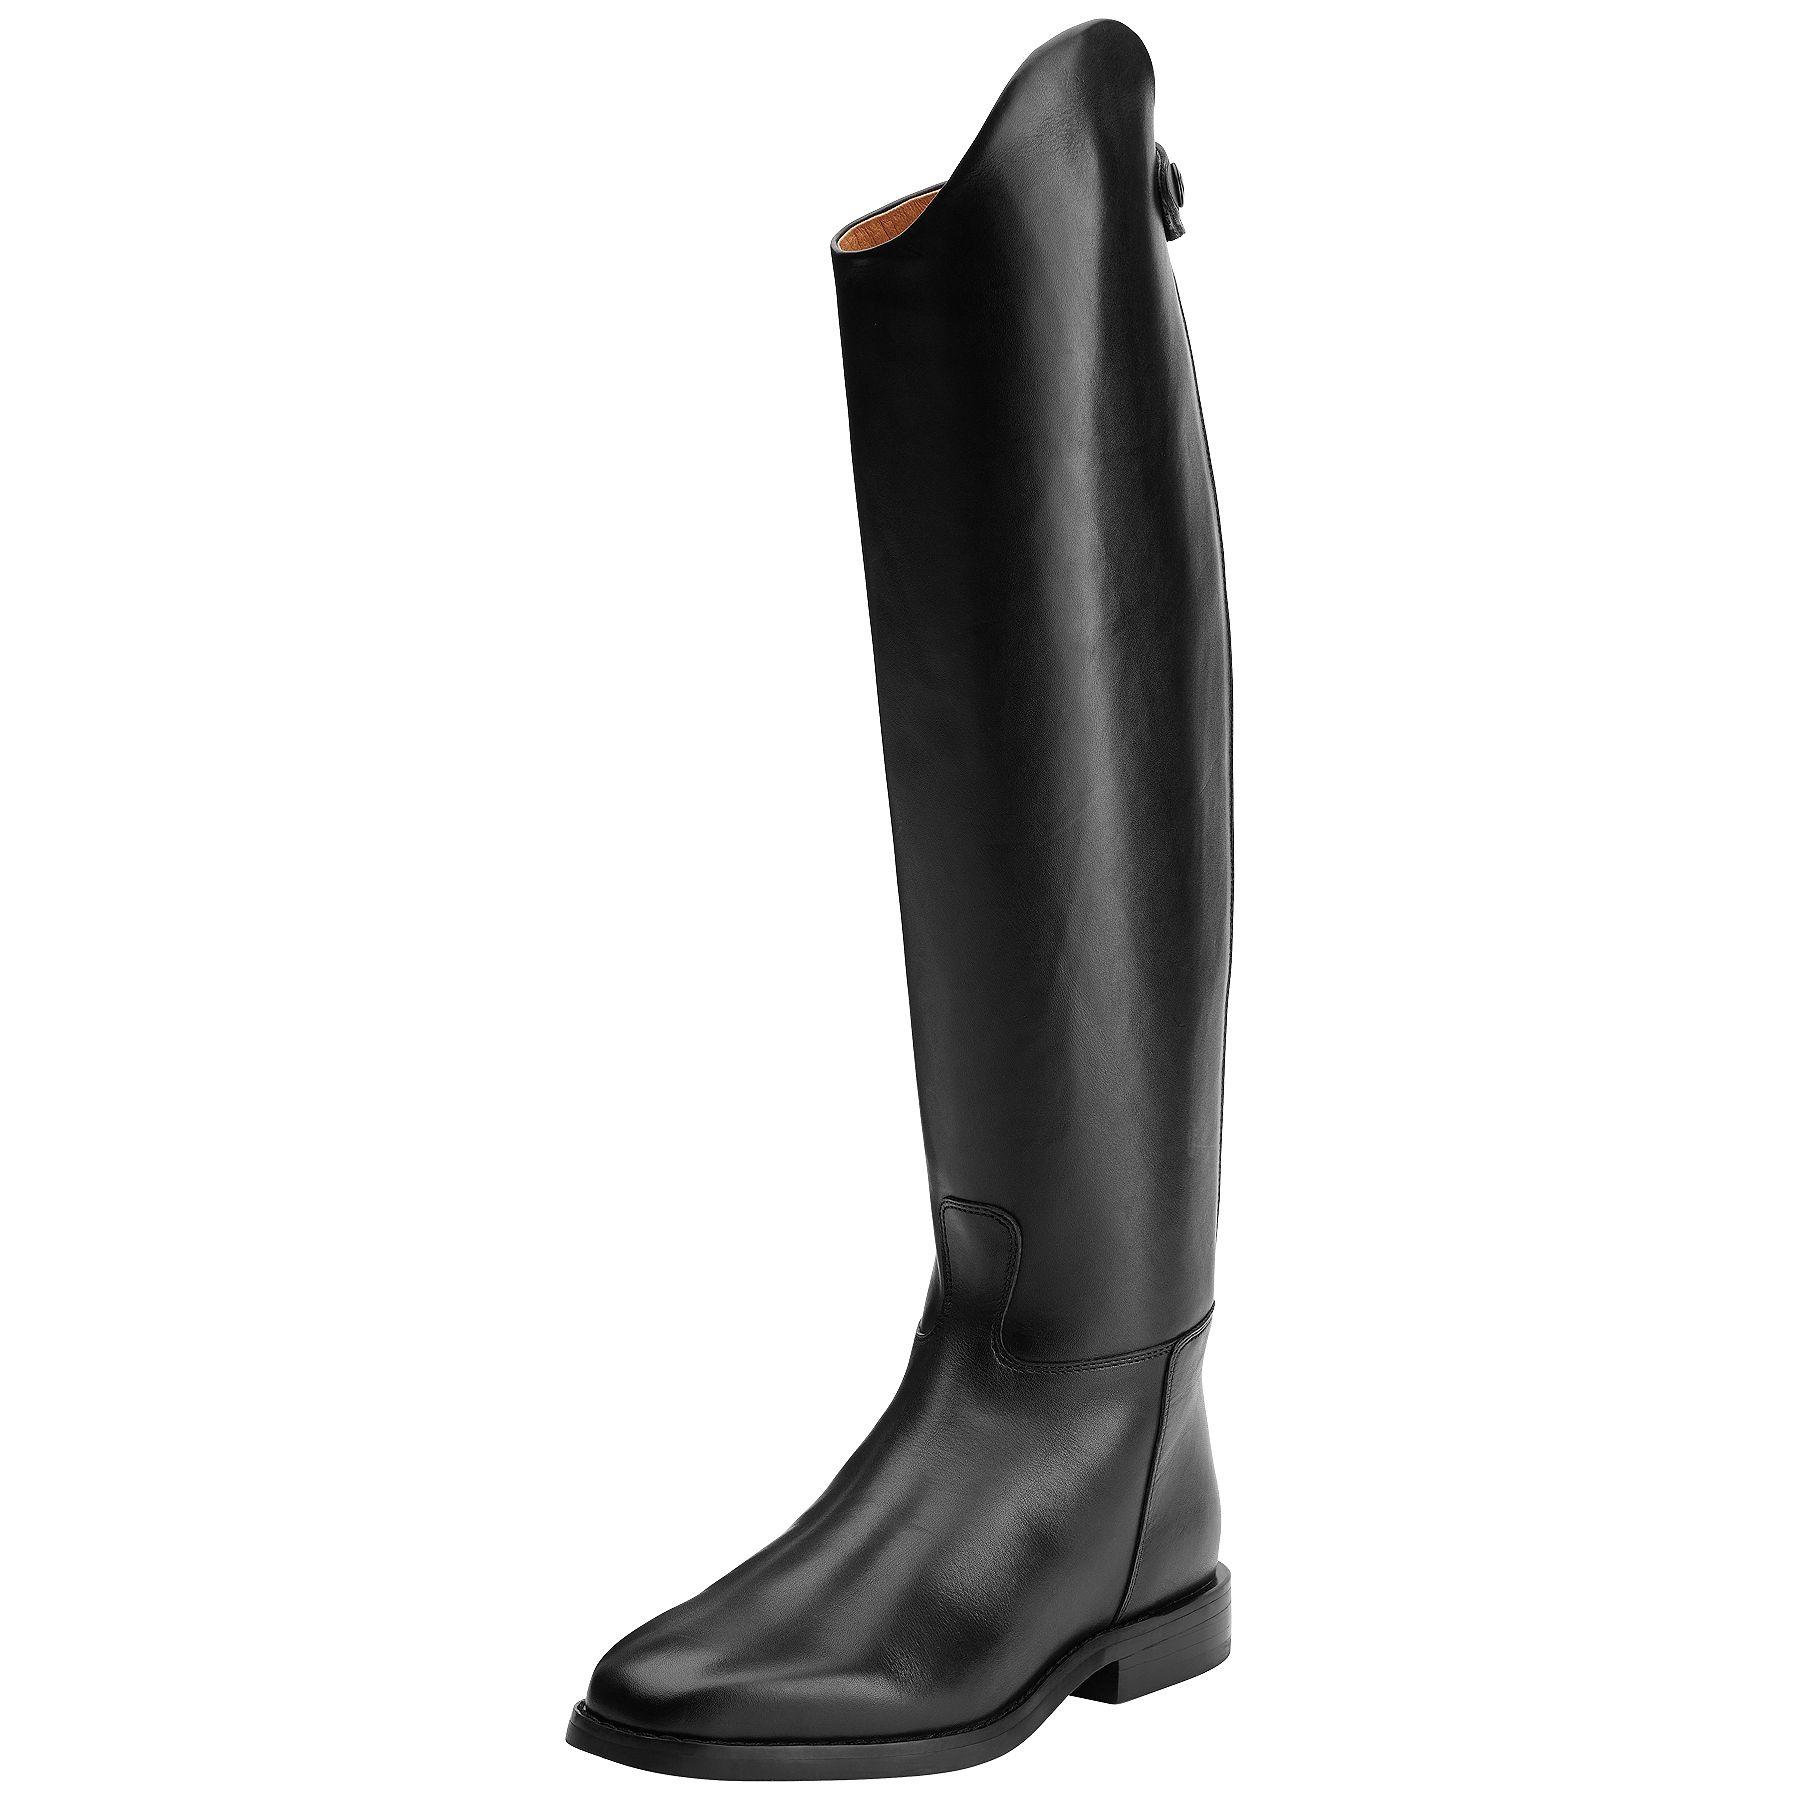 Ariat Cadence Dressage Boot - Ladies, Black